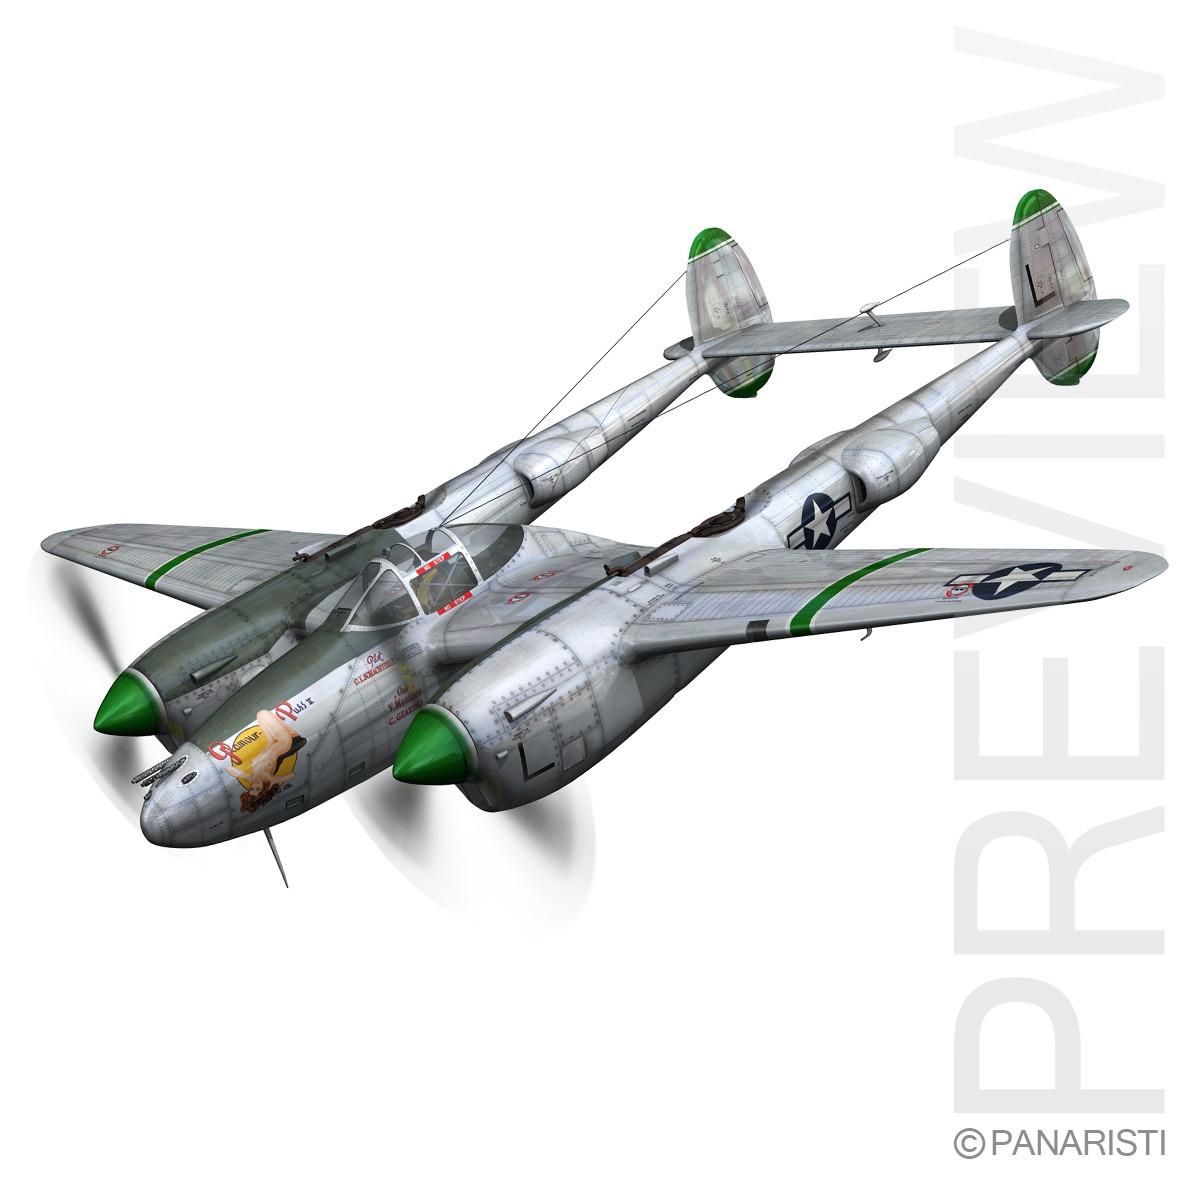 Lockheed P-38 Lightning - Glamour Puss II